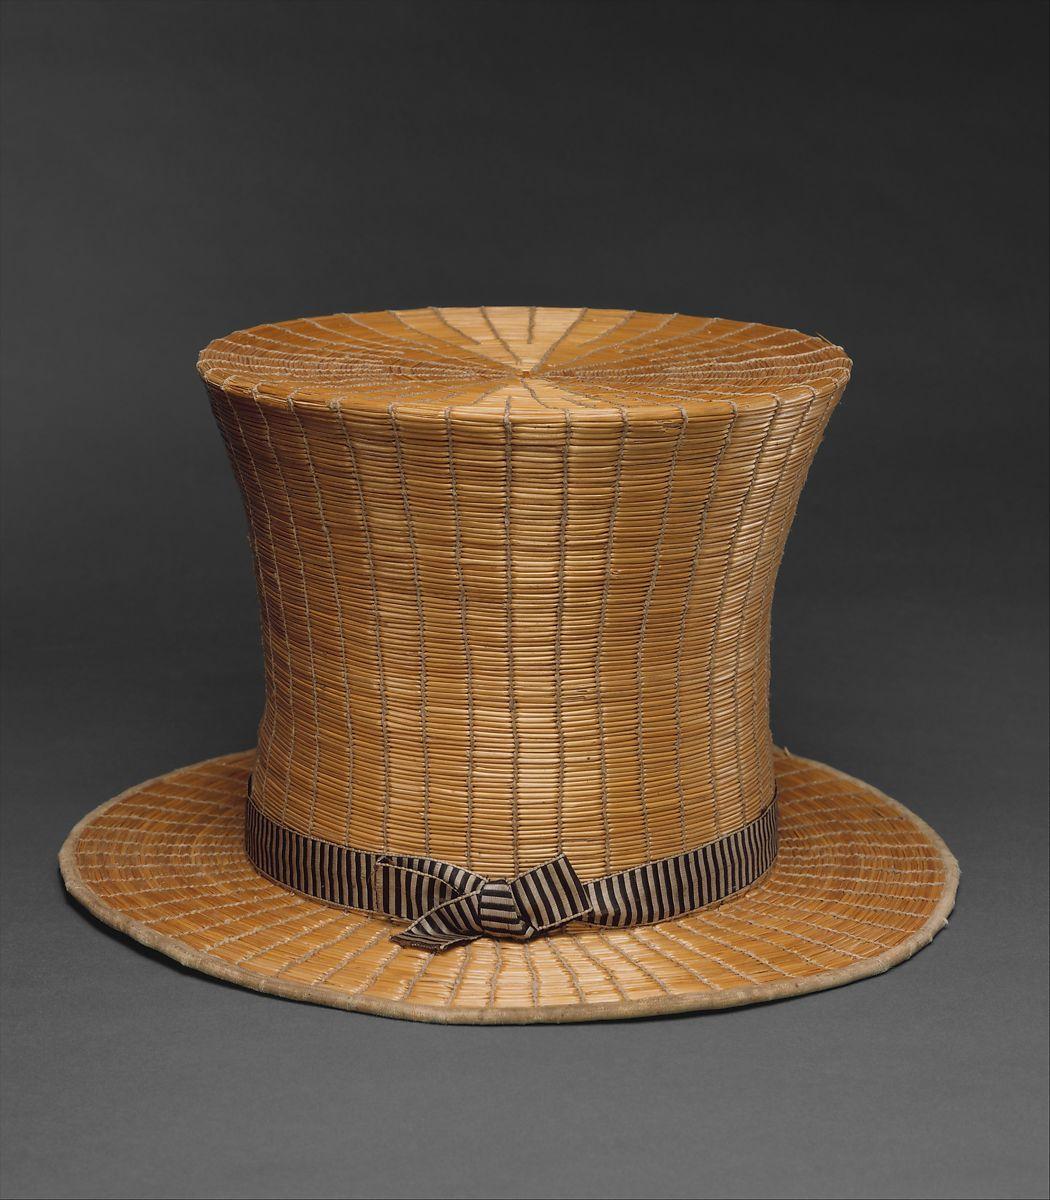 Top Hat French The Met Ca 1820 1984 580 2 In 2020 Top Hat Hats Vintage Hats